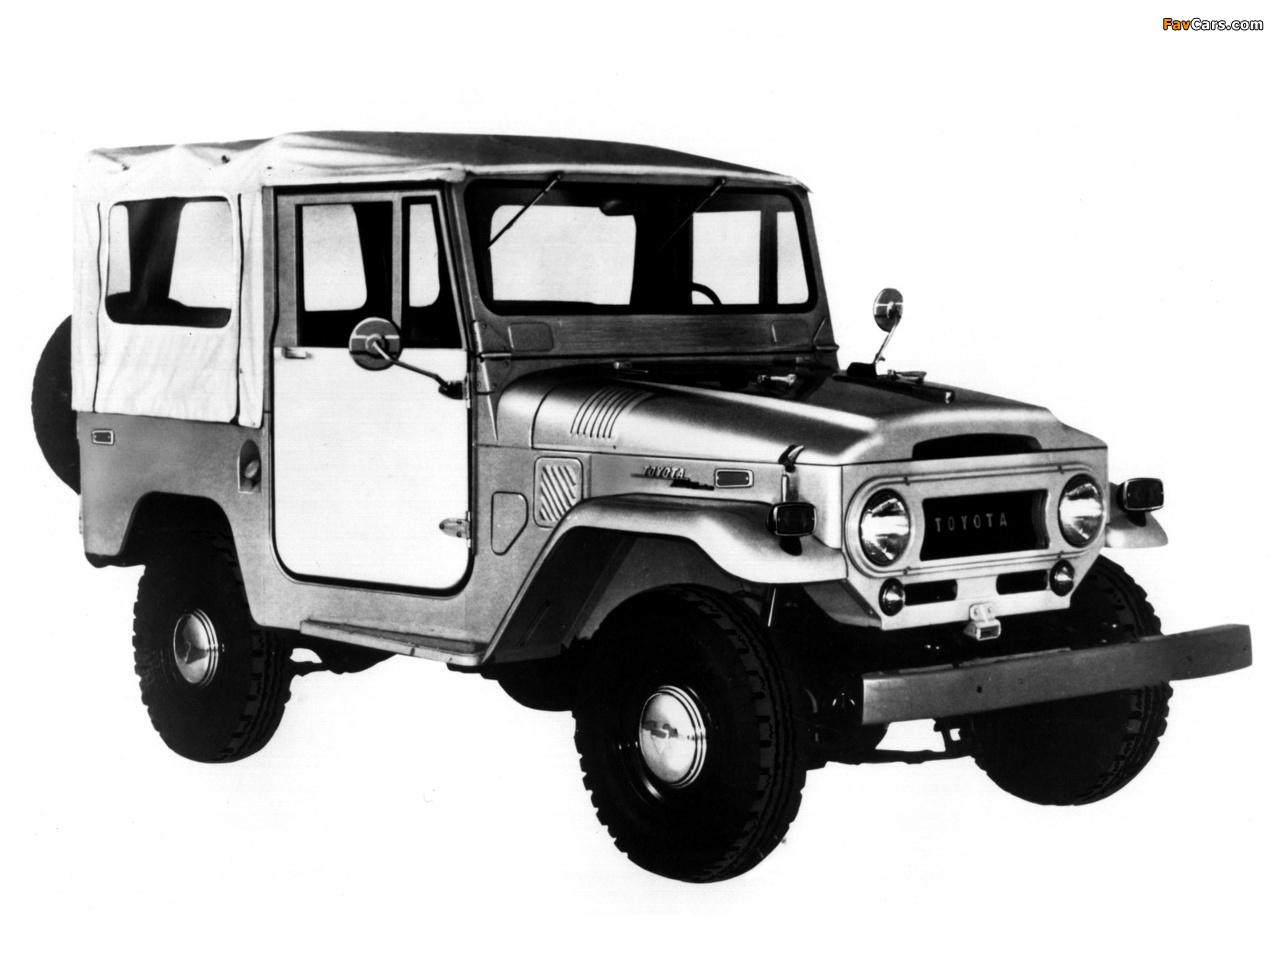 toyota land cruiser  fj40l  1960 73 images  1280x960 Toyota Land Cruiser Classic 77 Toyota Land Cruiser Parts